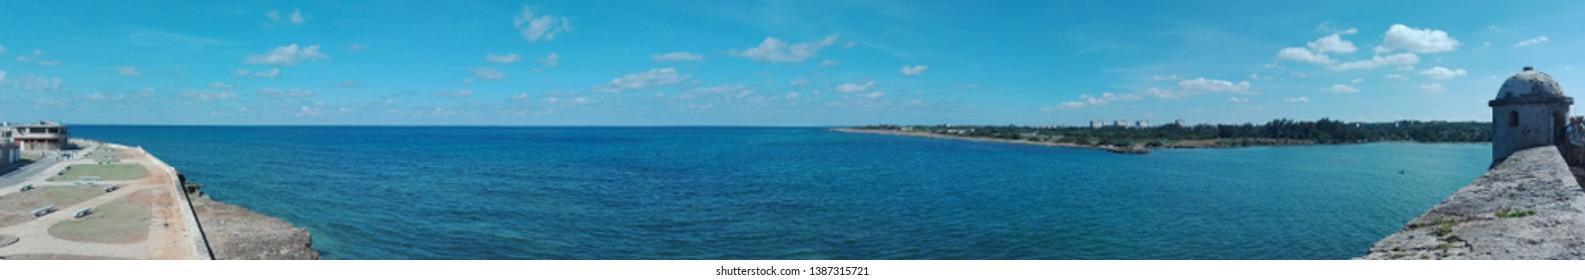 Panoramic view of Cojimar bay, La Habana, Cuba.  Sea landscape. Sea panoramic wallpaper